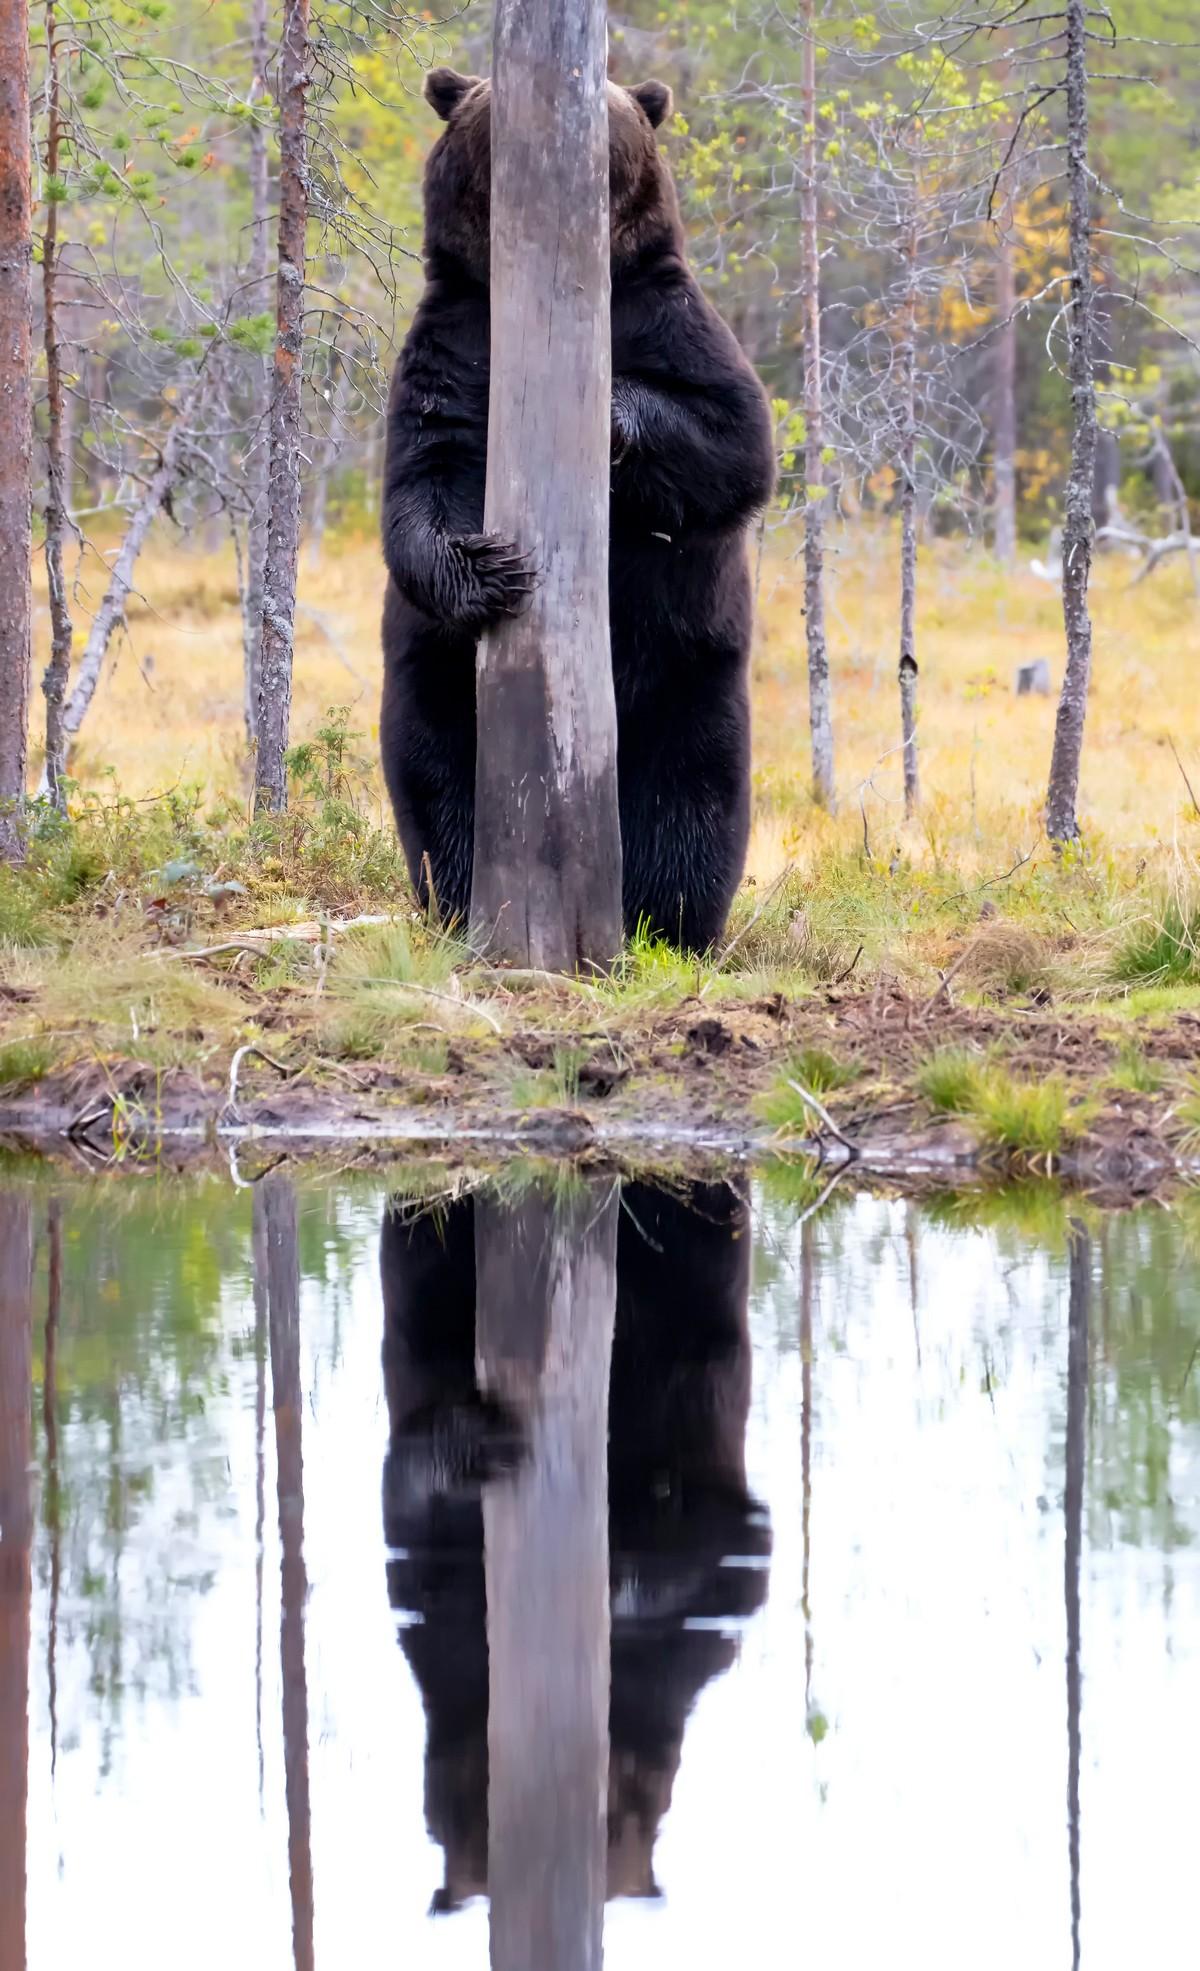 Финалисты смешного фотоконкурса The Comedy Wildlife Photography Awards 2020